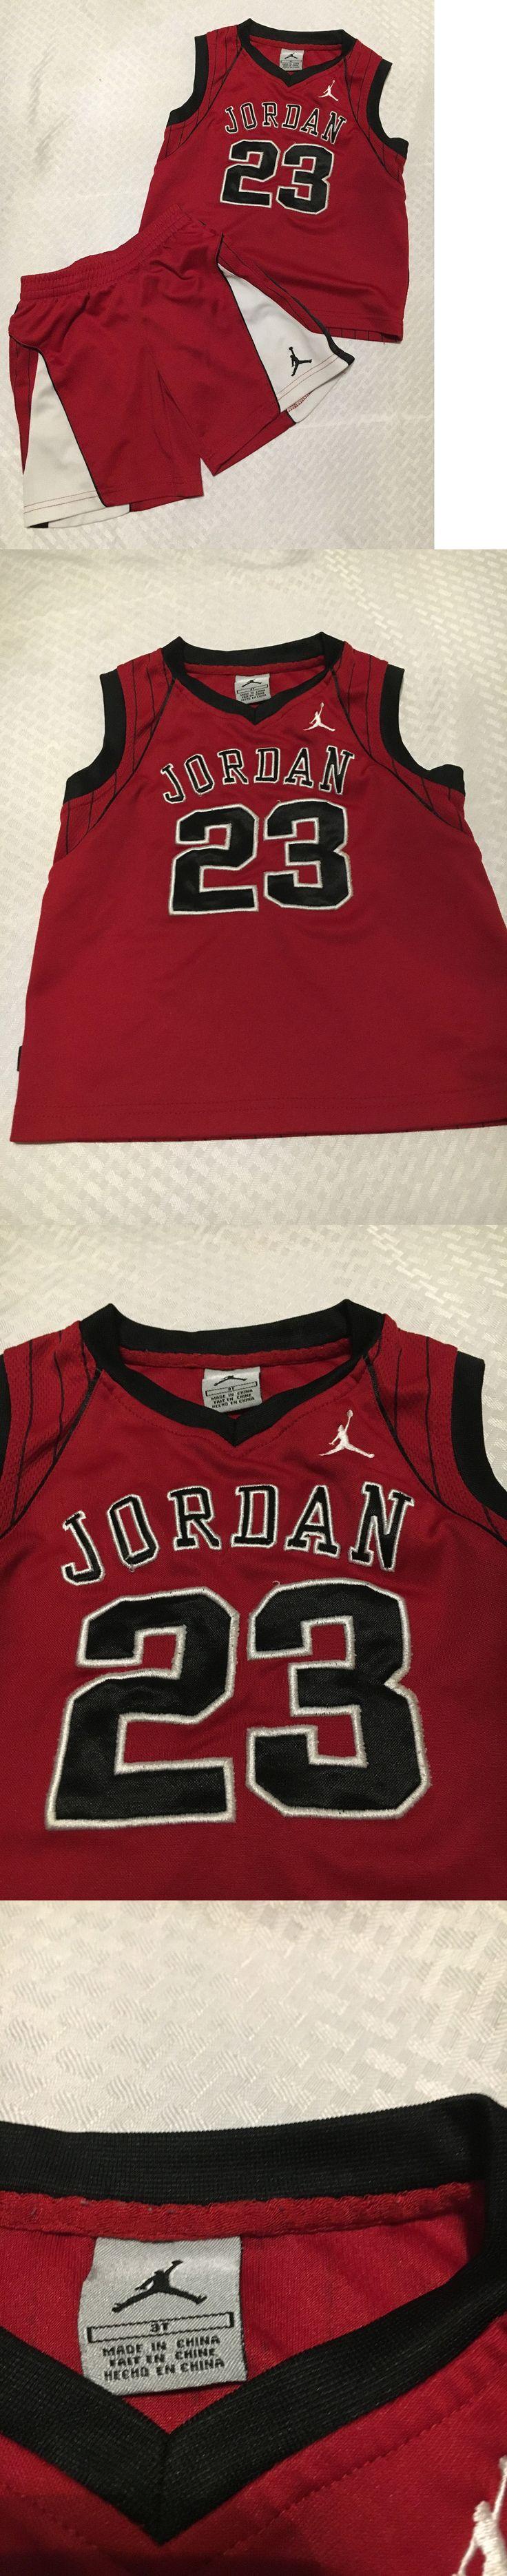 Michael Jordan Baby Clothing: Air Jordan Michael Jordan Kids 3T Outfit 2 Piece Set BUY IT NOW ONLY: $14.99